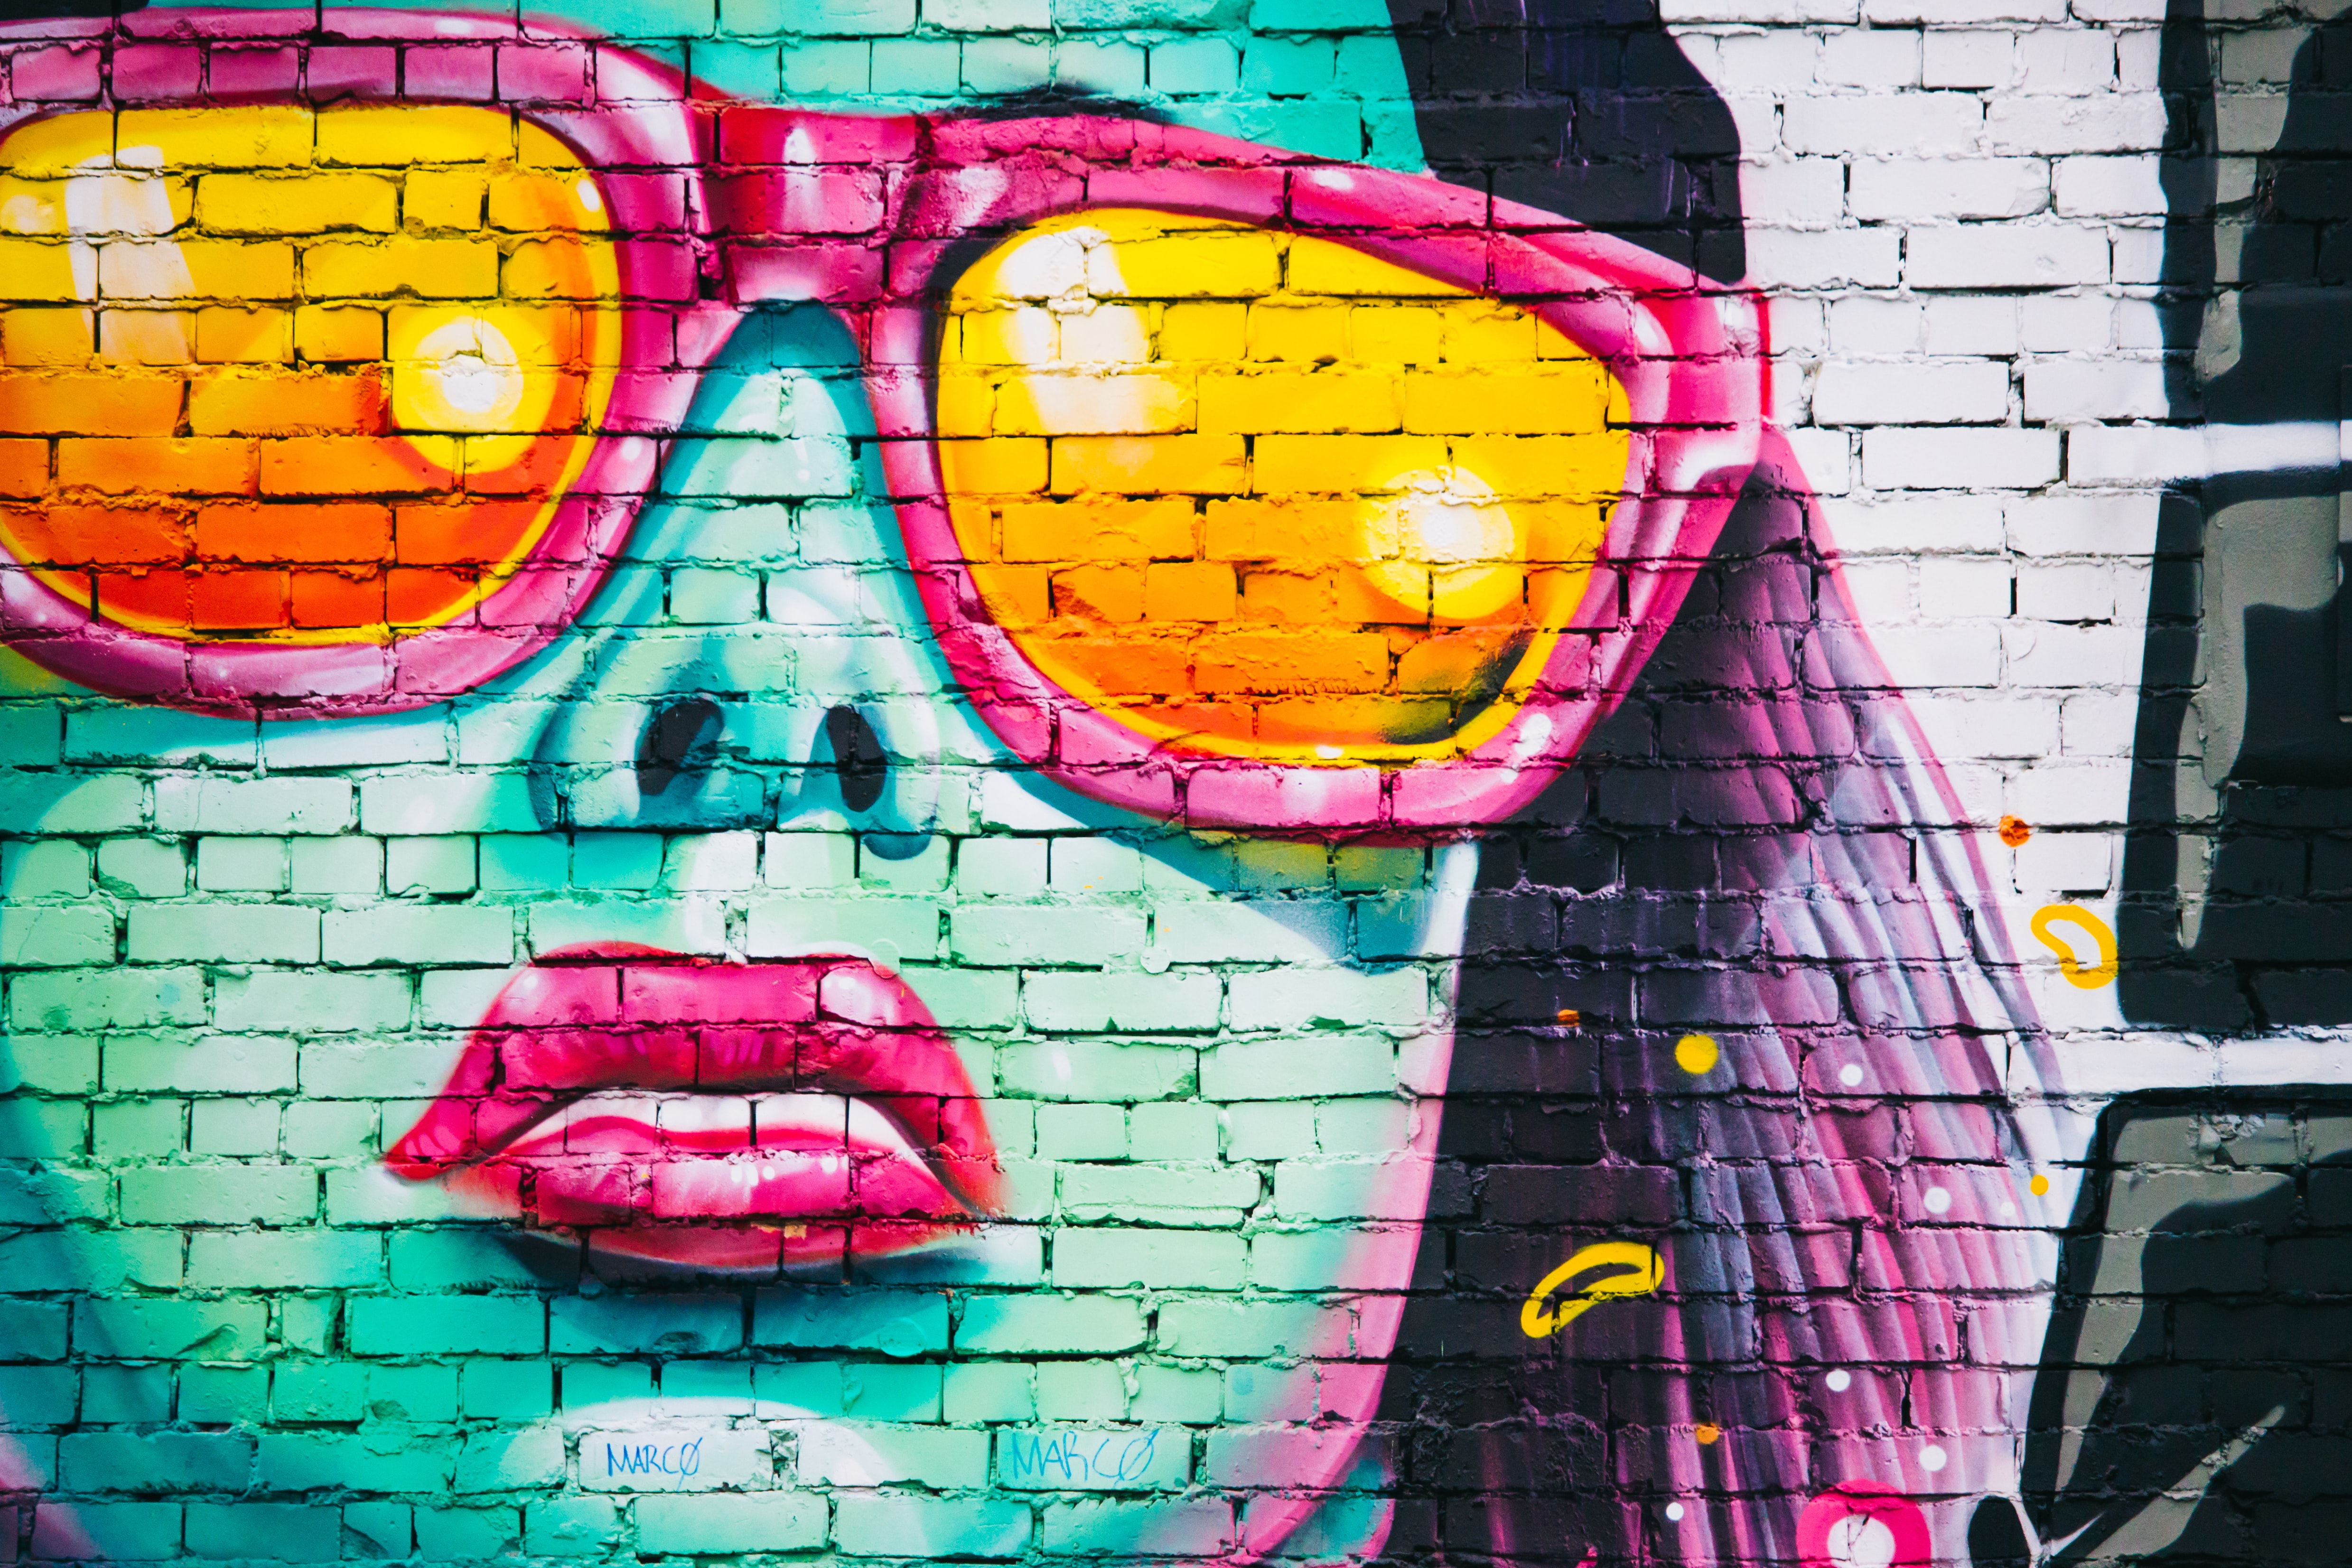 Graffiti Wall 4k , HD Wallpaper & Backgrounds